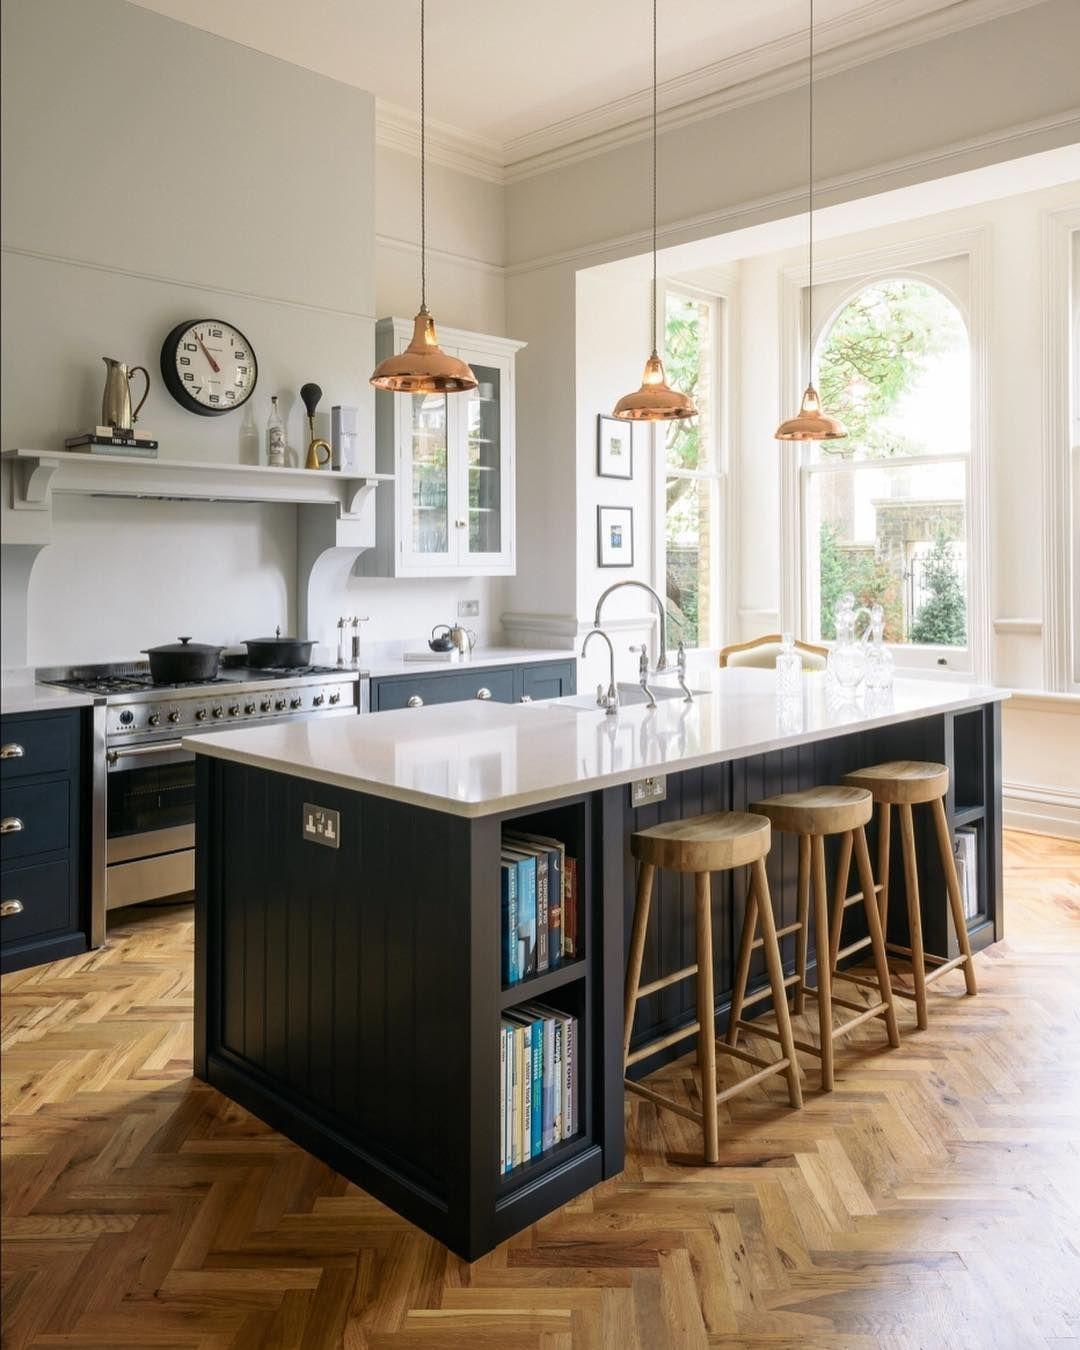 Shelf Over Range Kitchen Design Modern Kitchen Kitchen Remodel Beautiful kitchens bedrooms and